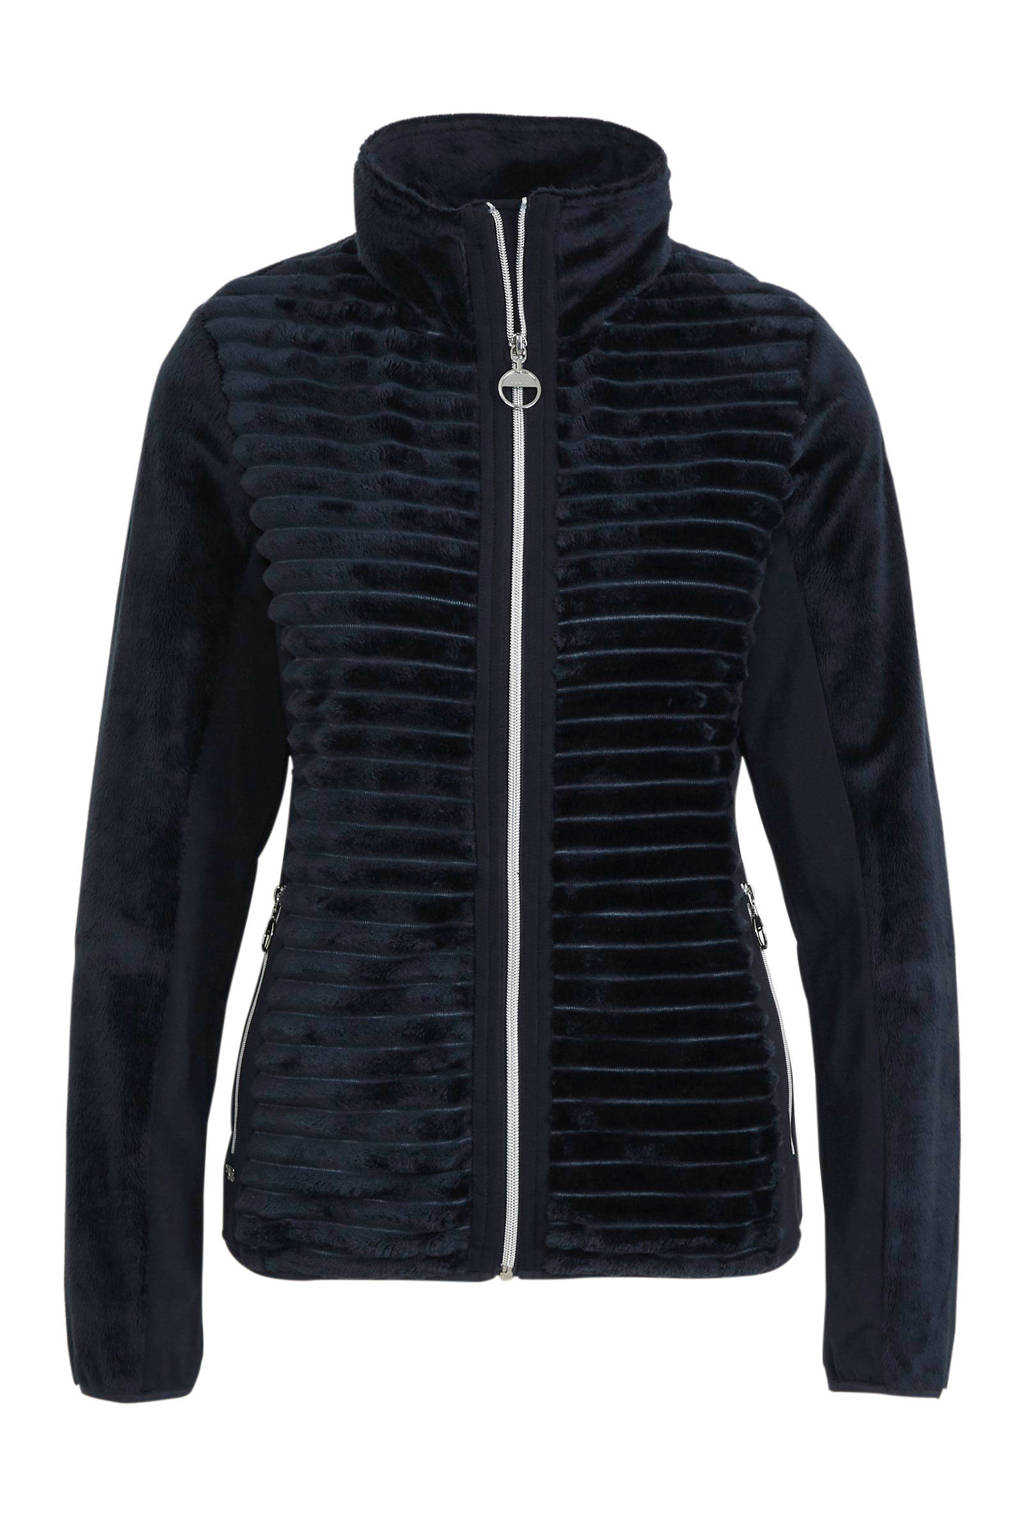 Luhta outdoor vest Eiramo donkerblauw, Donkerblauw